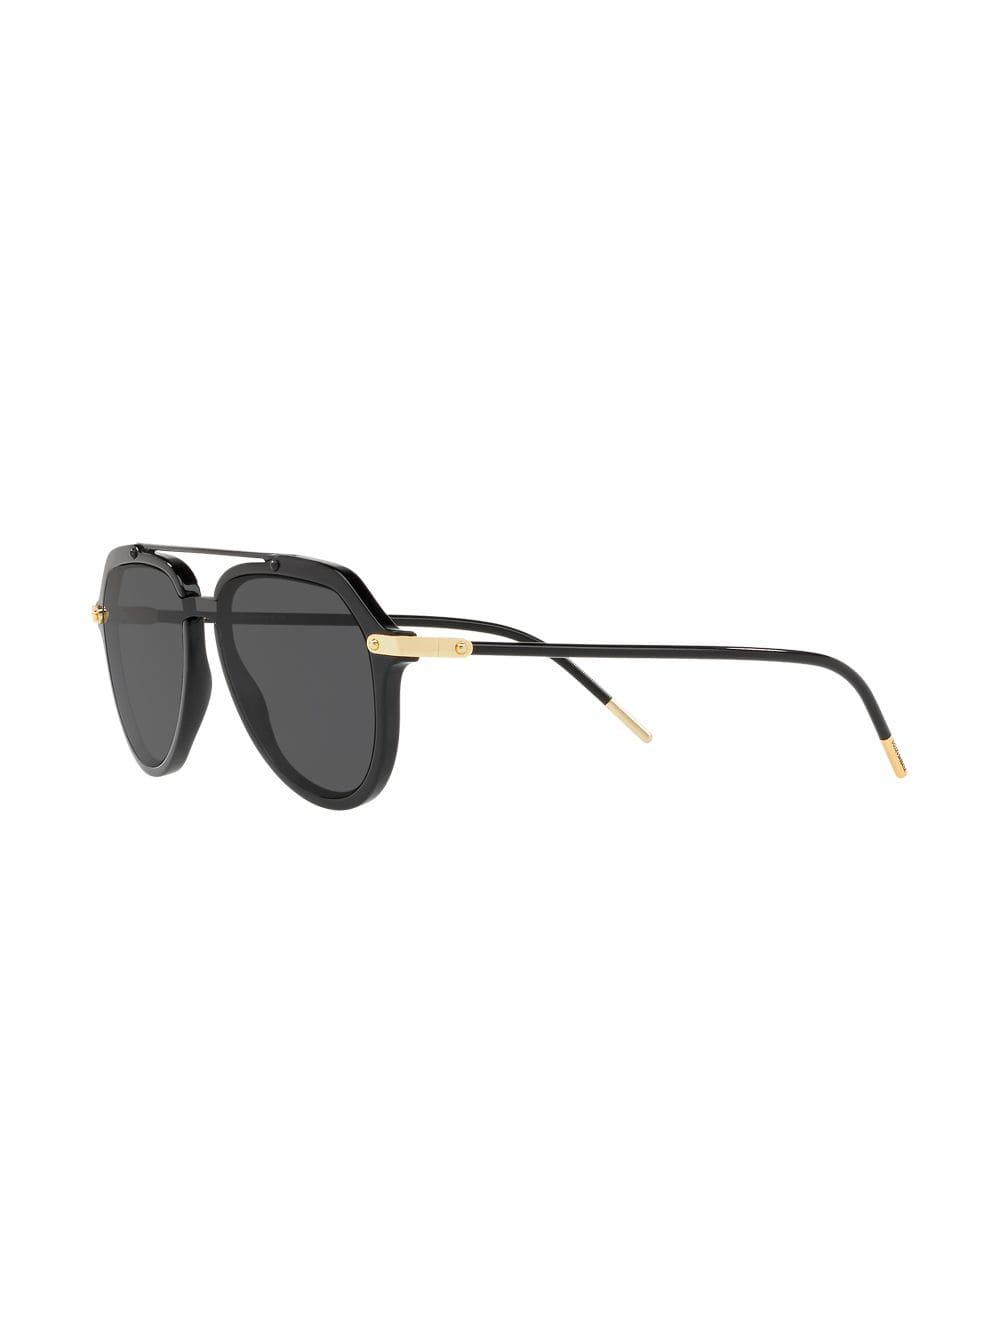 4eeb925e142b8 Dolce   Gabbana Aviator Sunglasses in Black for Men - Lyst